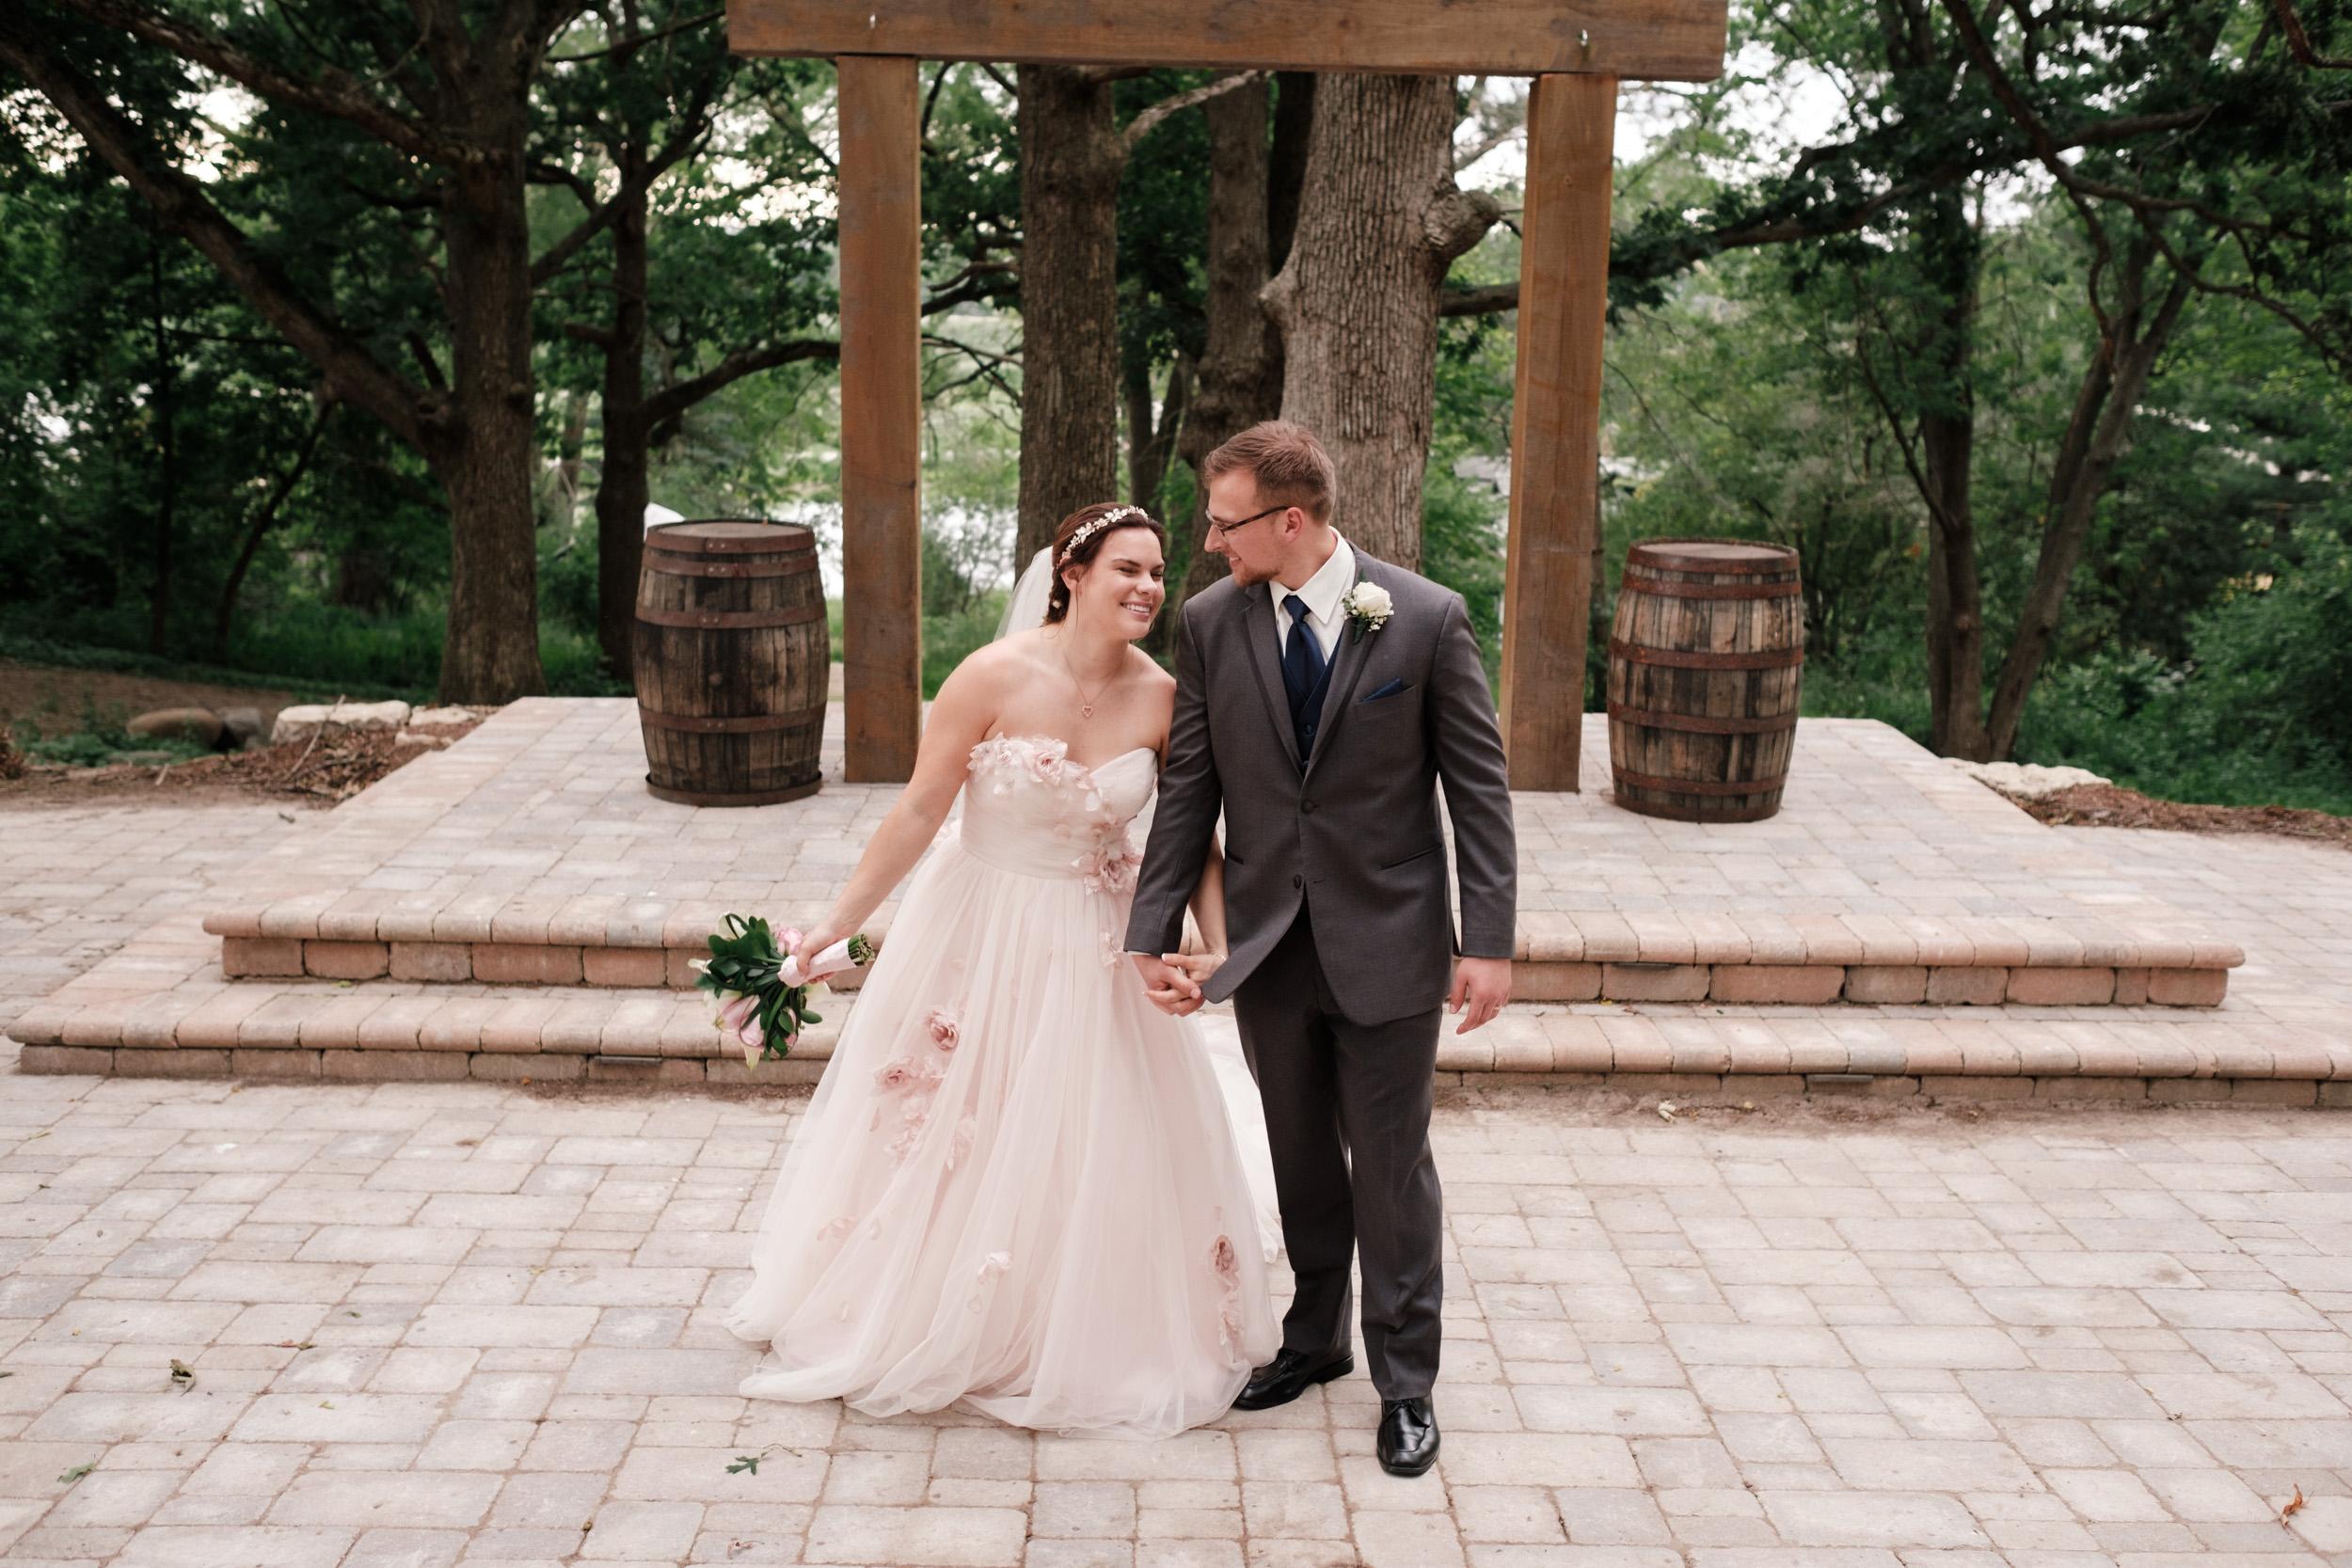 19-06-22-Ryan-Katie-The-Fields-Reserve-Wedding-46.jpg